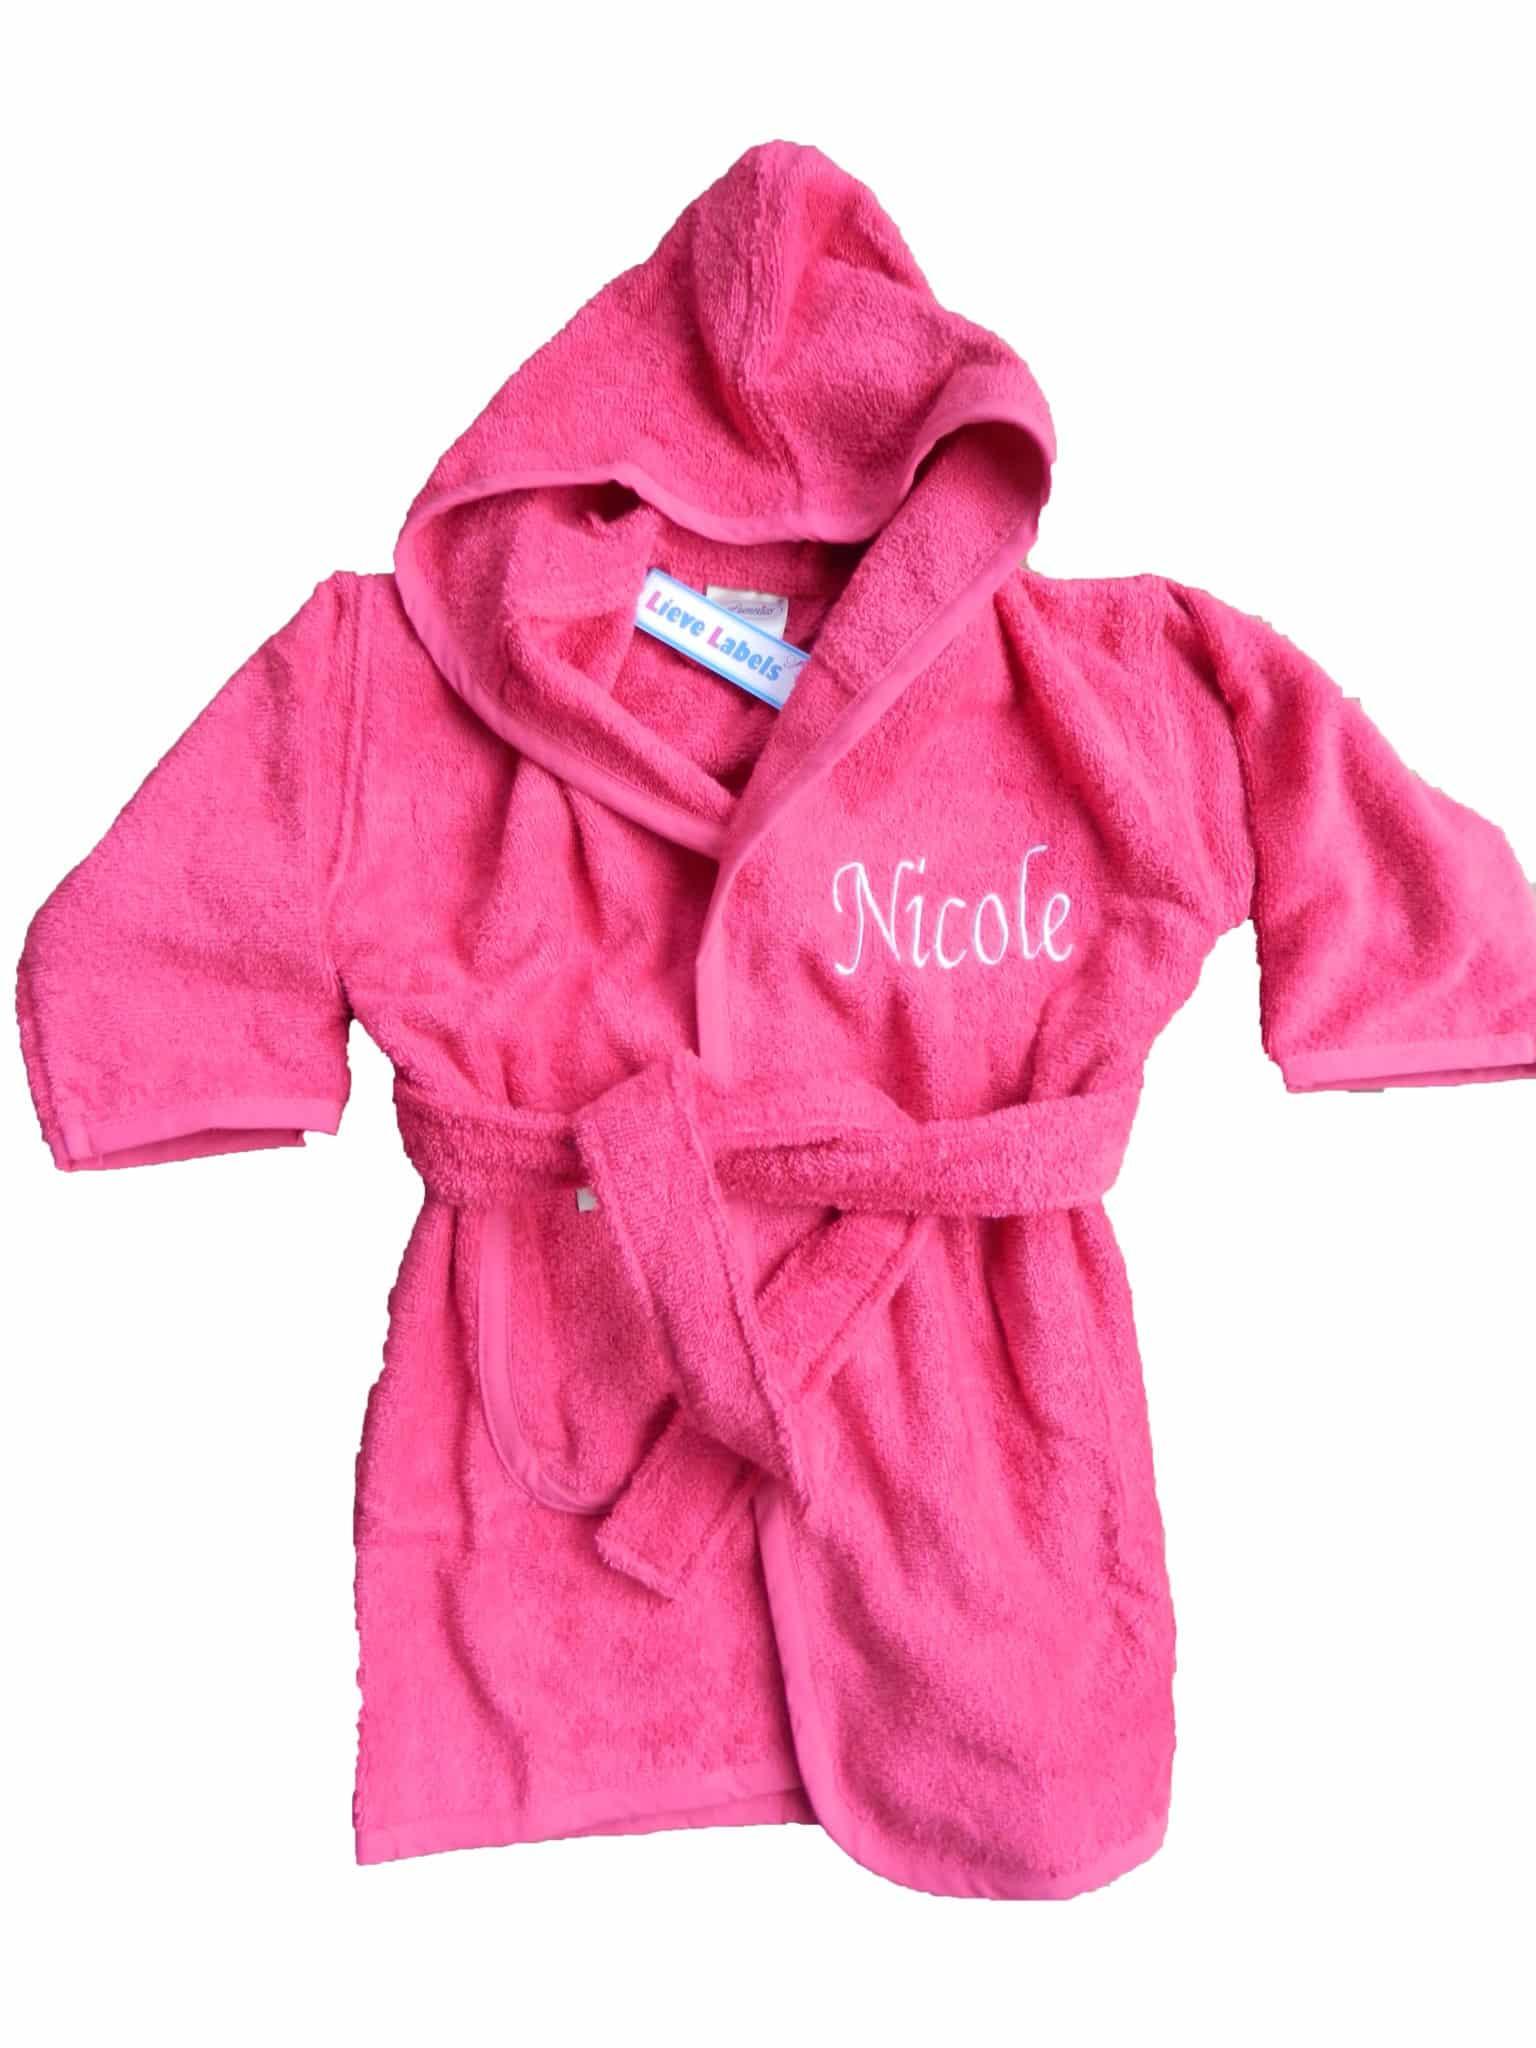 a2d57c5686a Baby Badjas met naam - Lieve Labels.nl